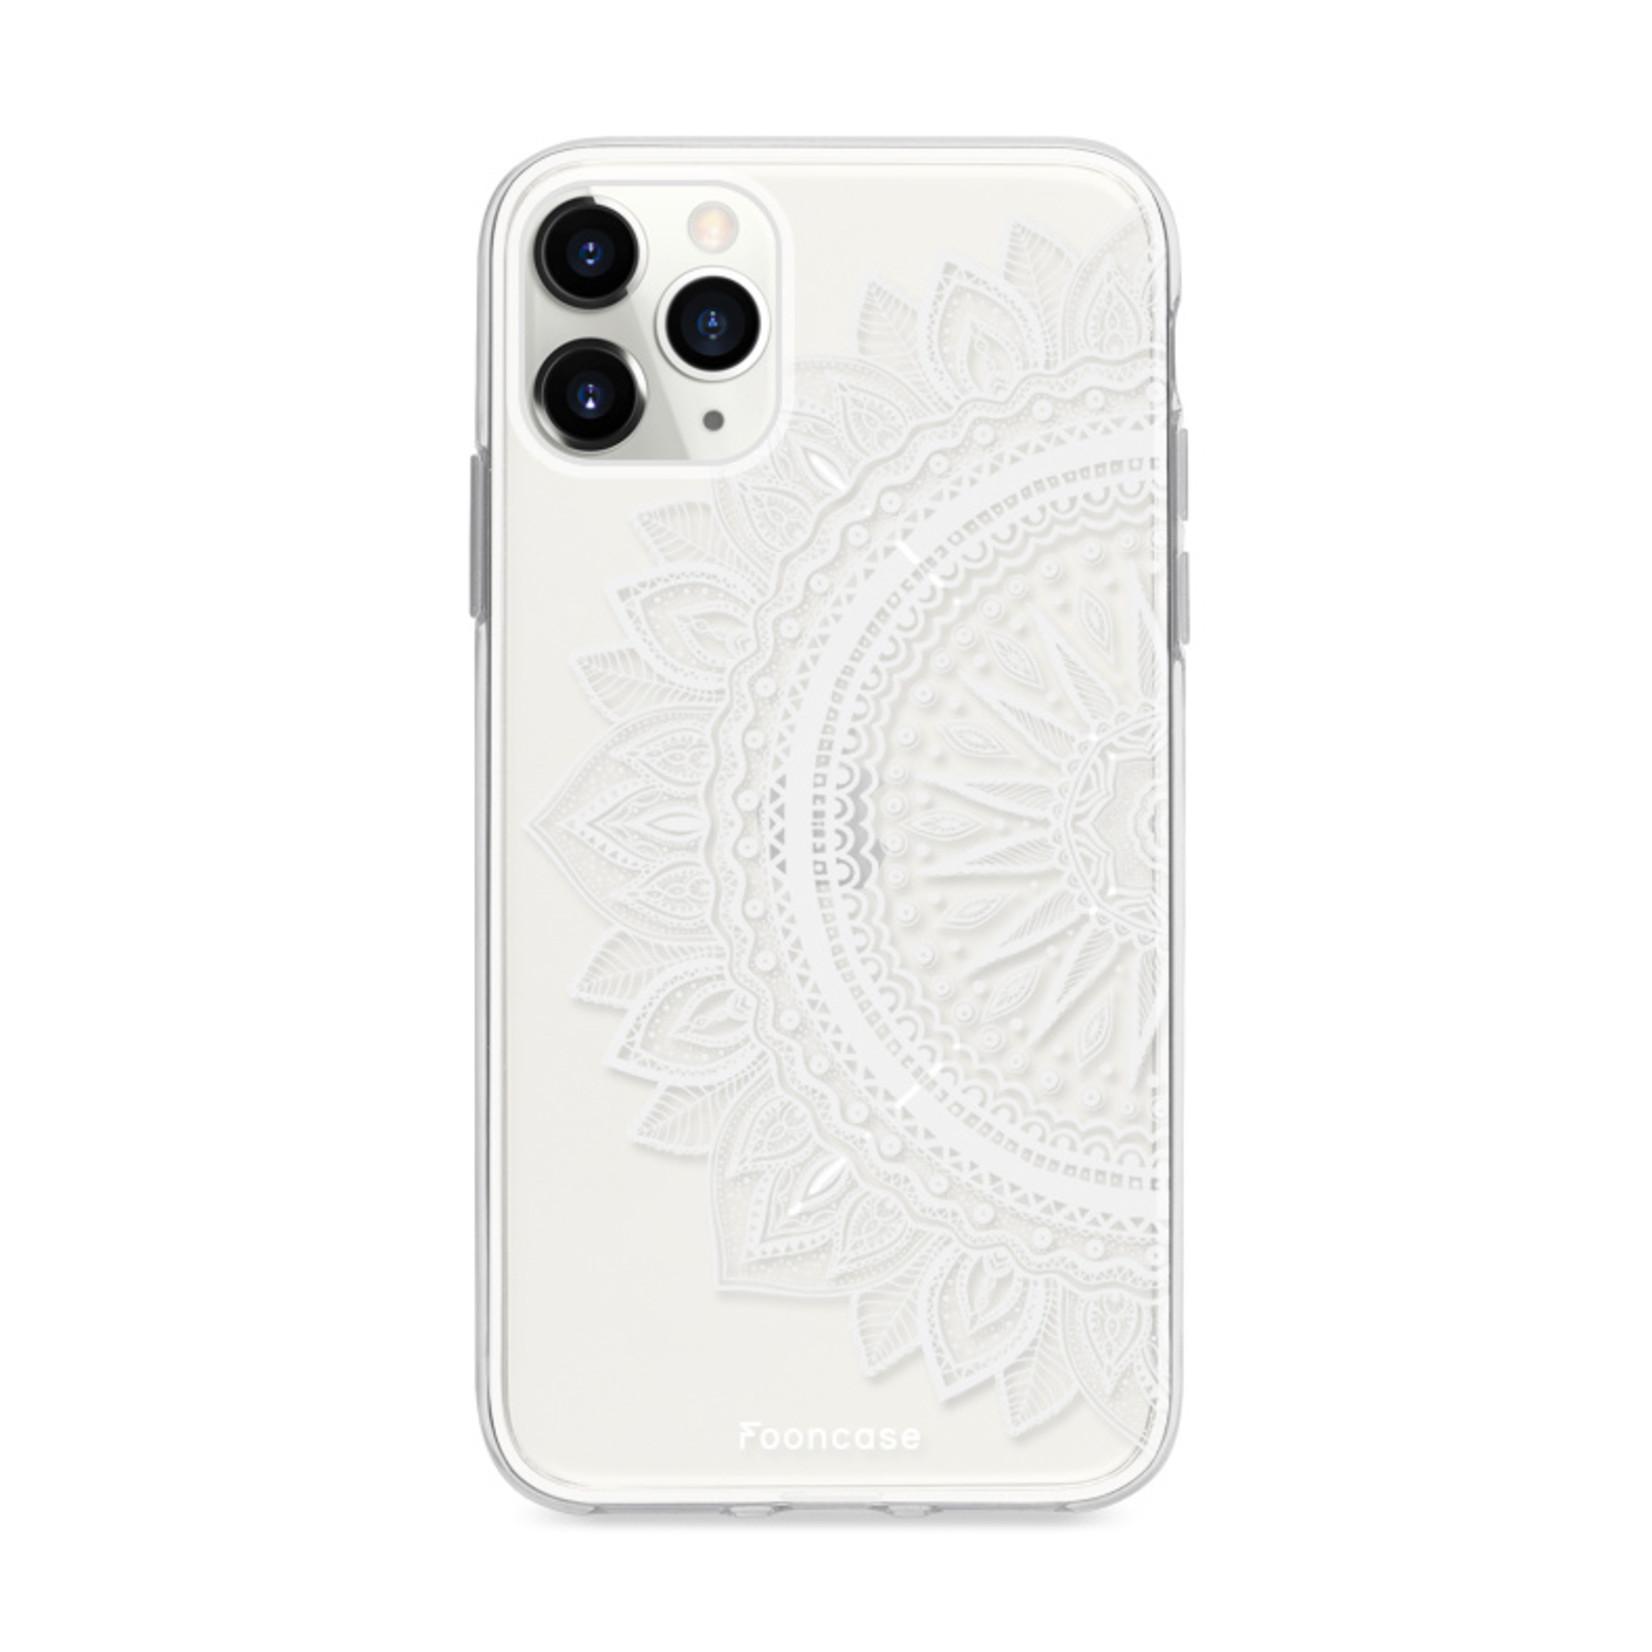 FOONCASE iPhone 12 Pro Max hoesje TPU Soft Case - Back Cover - Mandala / Ibiza